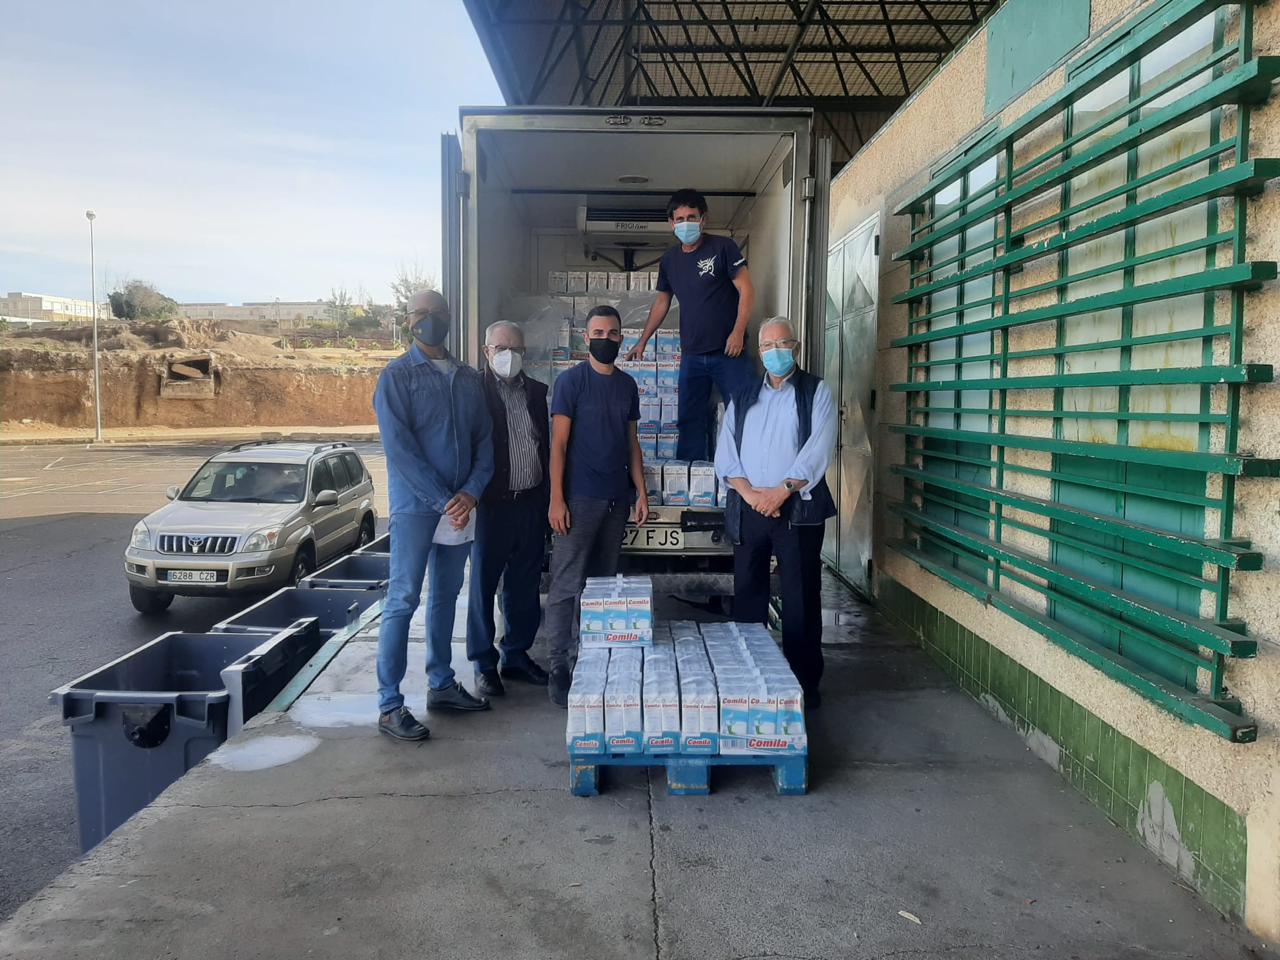 Entrega en el día de hoy de 960 litros de leche entera a la Asociación benéfica Elomar